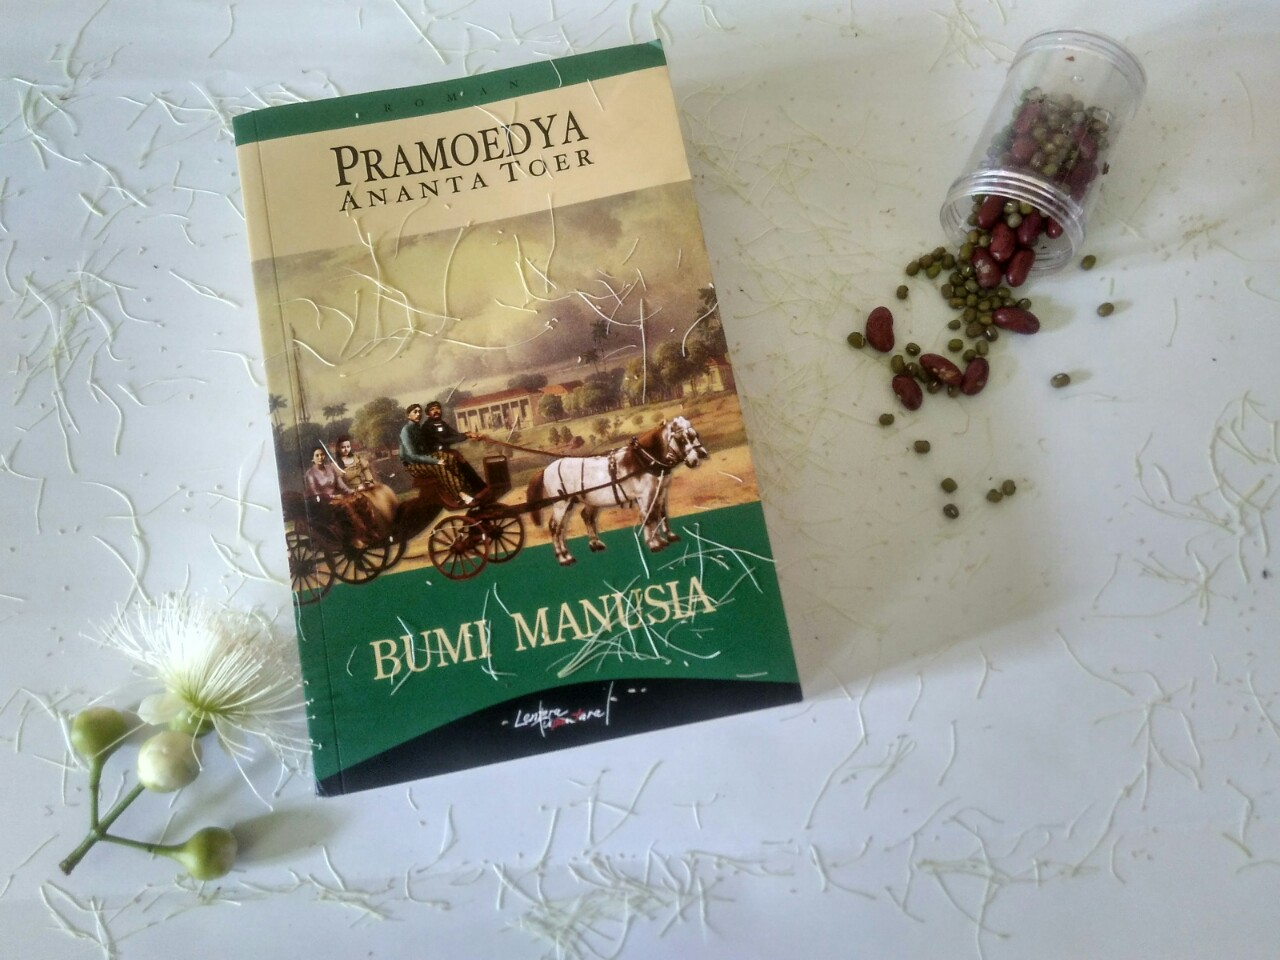 Review Buku Bumi Manusia by Pramoedya Ananta Toer